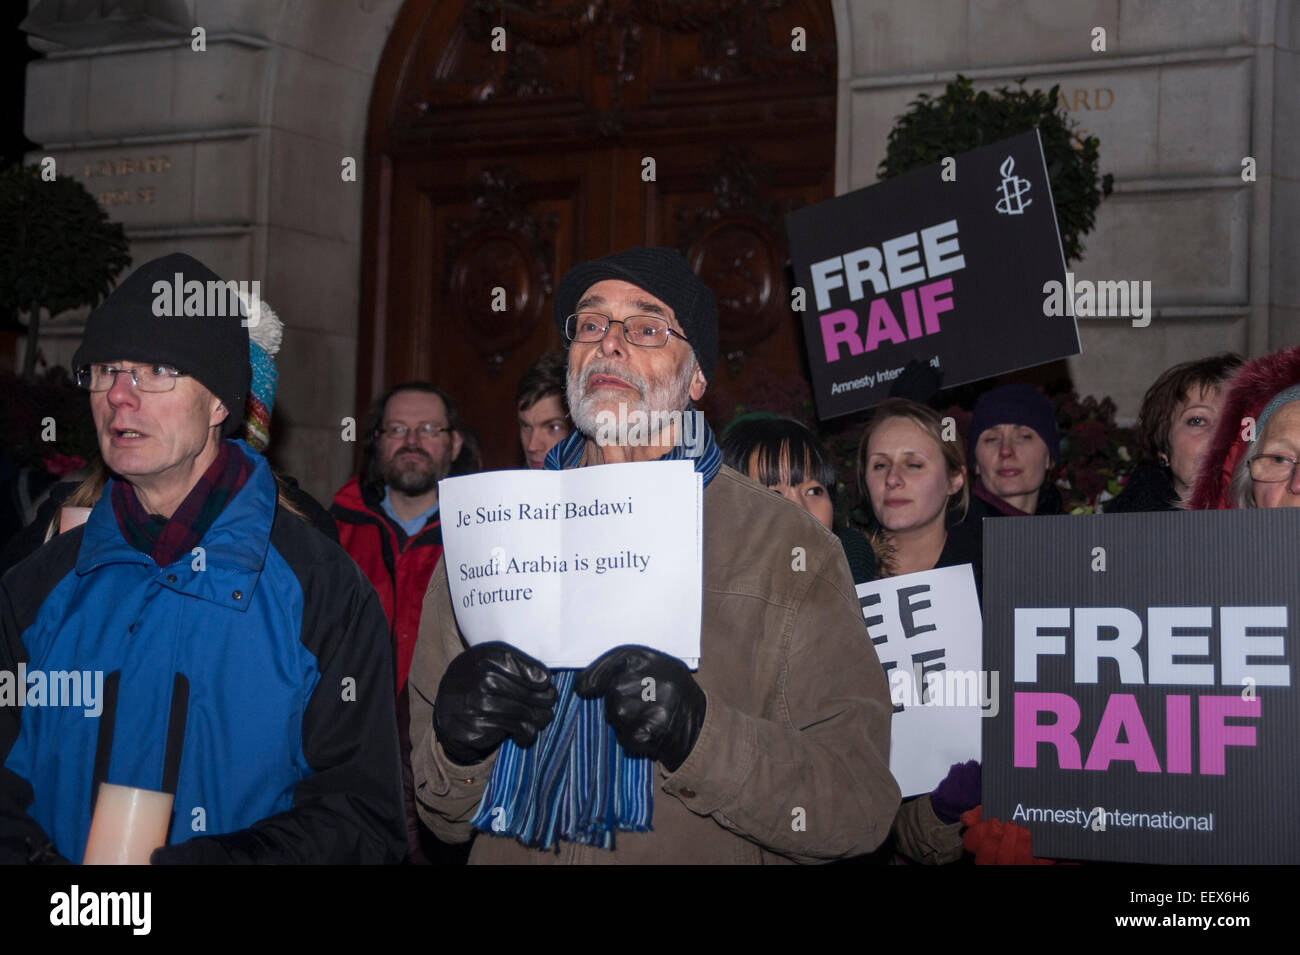 London, UK, 22 January 2015.  Outside the Saudi Arabian Embassy in London on 22 January 2015 people gather to attend - Stock Image